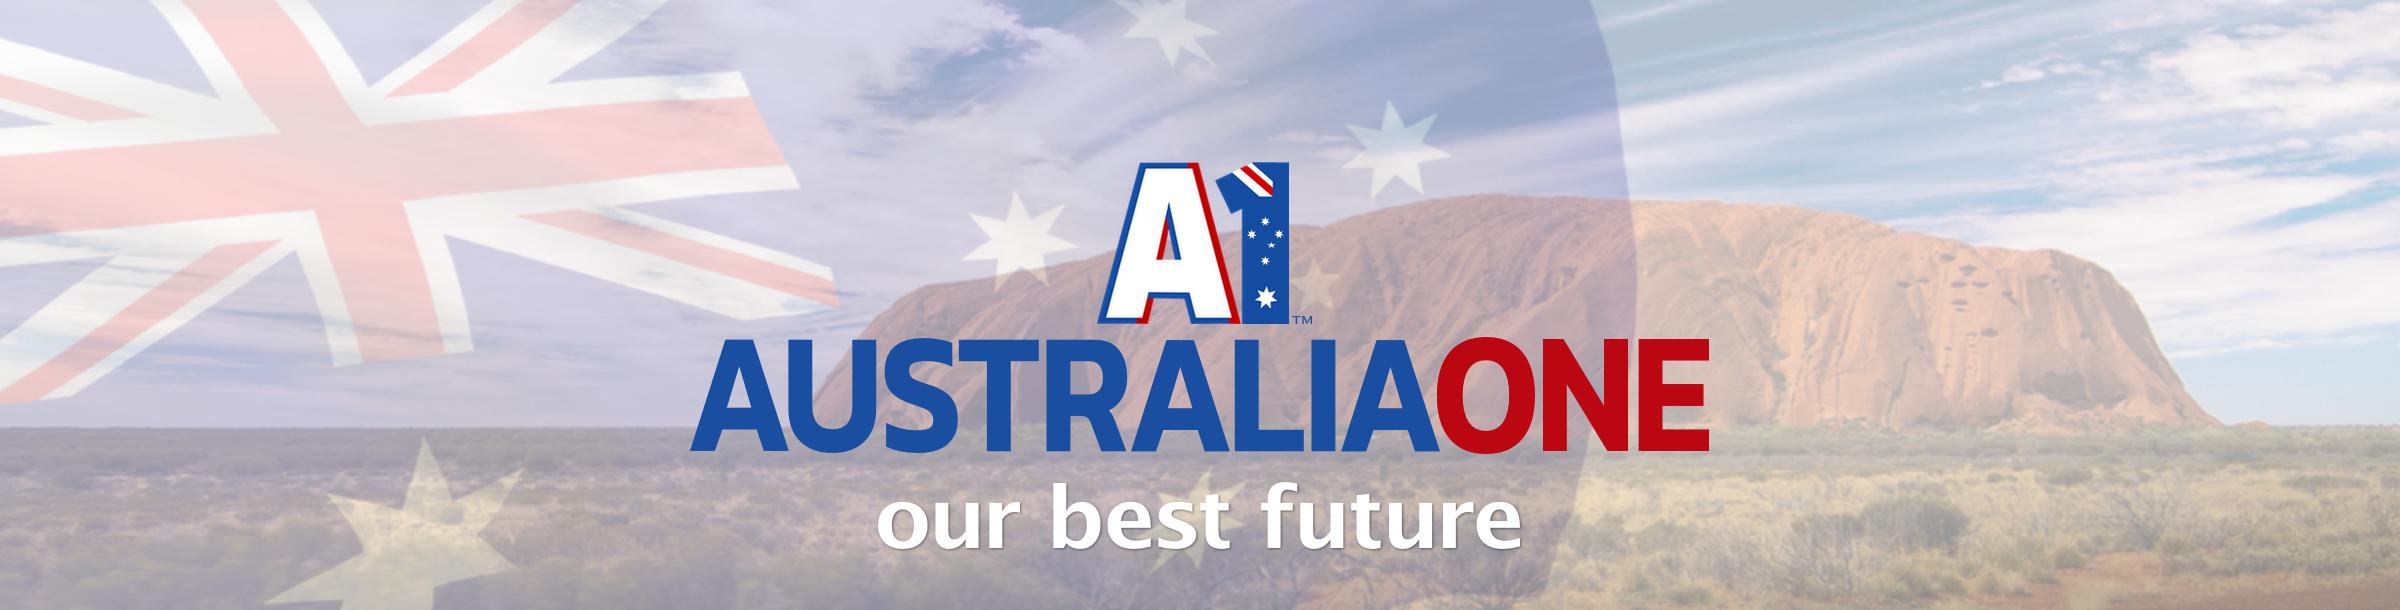 AUSTRALIAONE